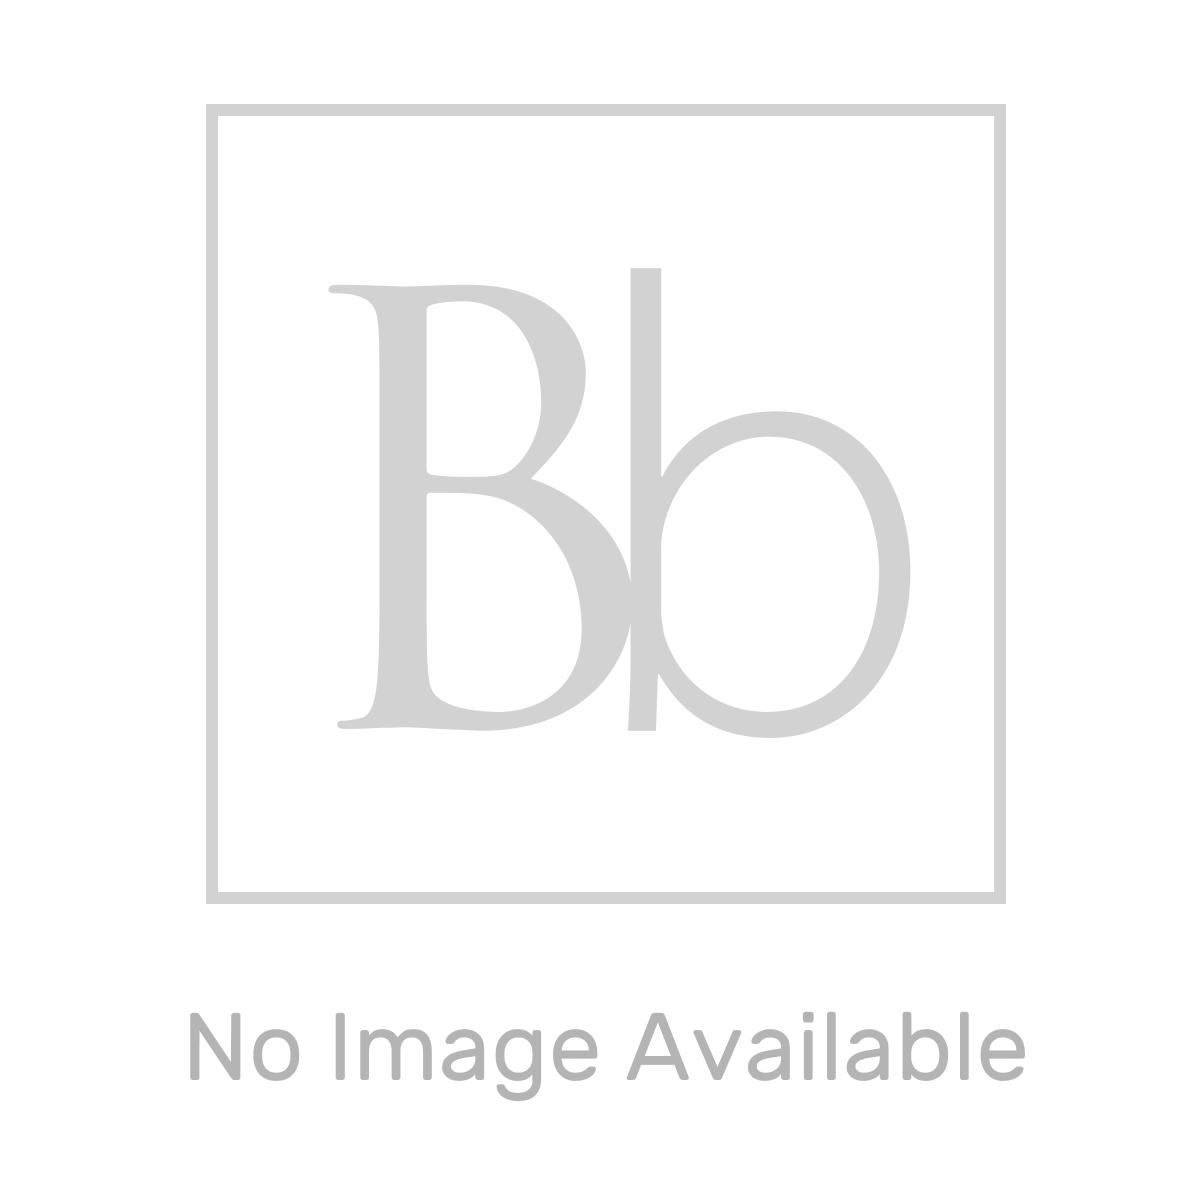 RAK Morning 1 Tap Hole Basin with Full Pedestal 650mm Measurements